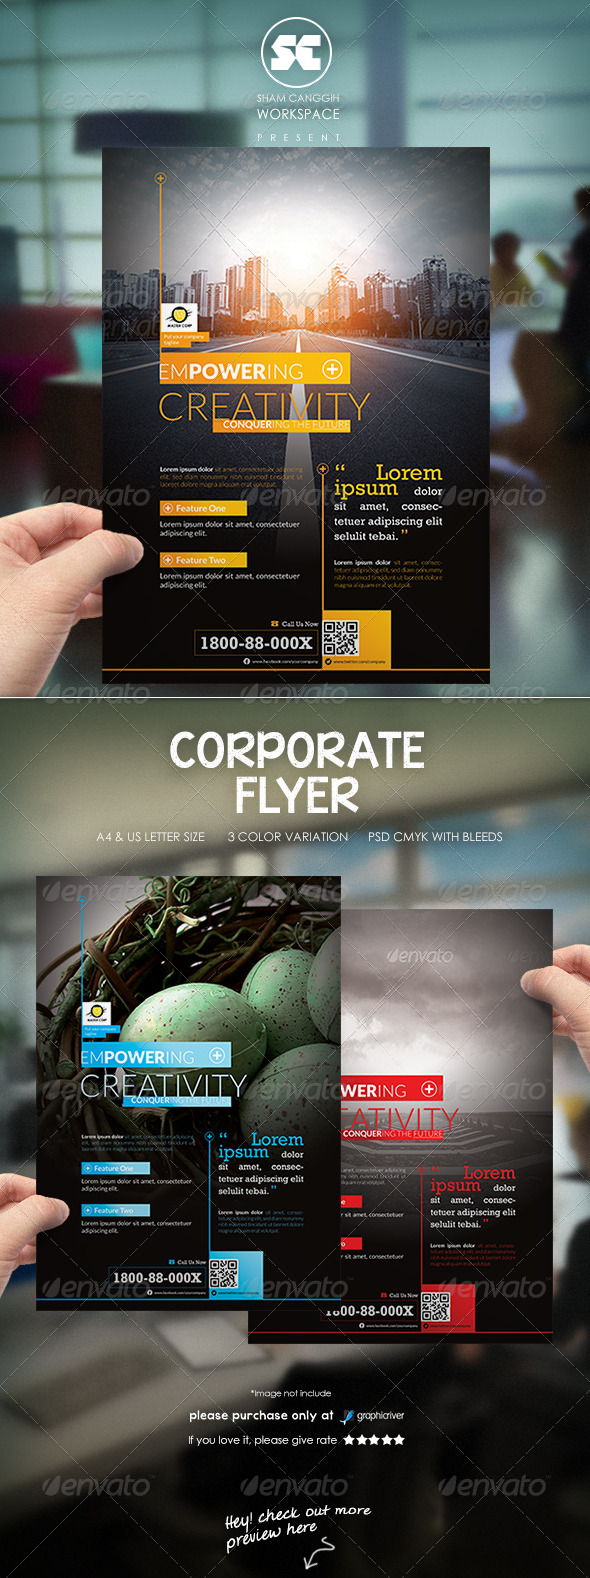 Clean & Modern Corporate Flyer Magazine Ads